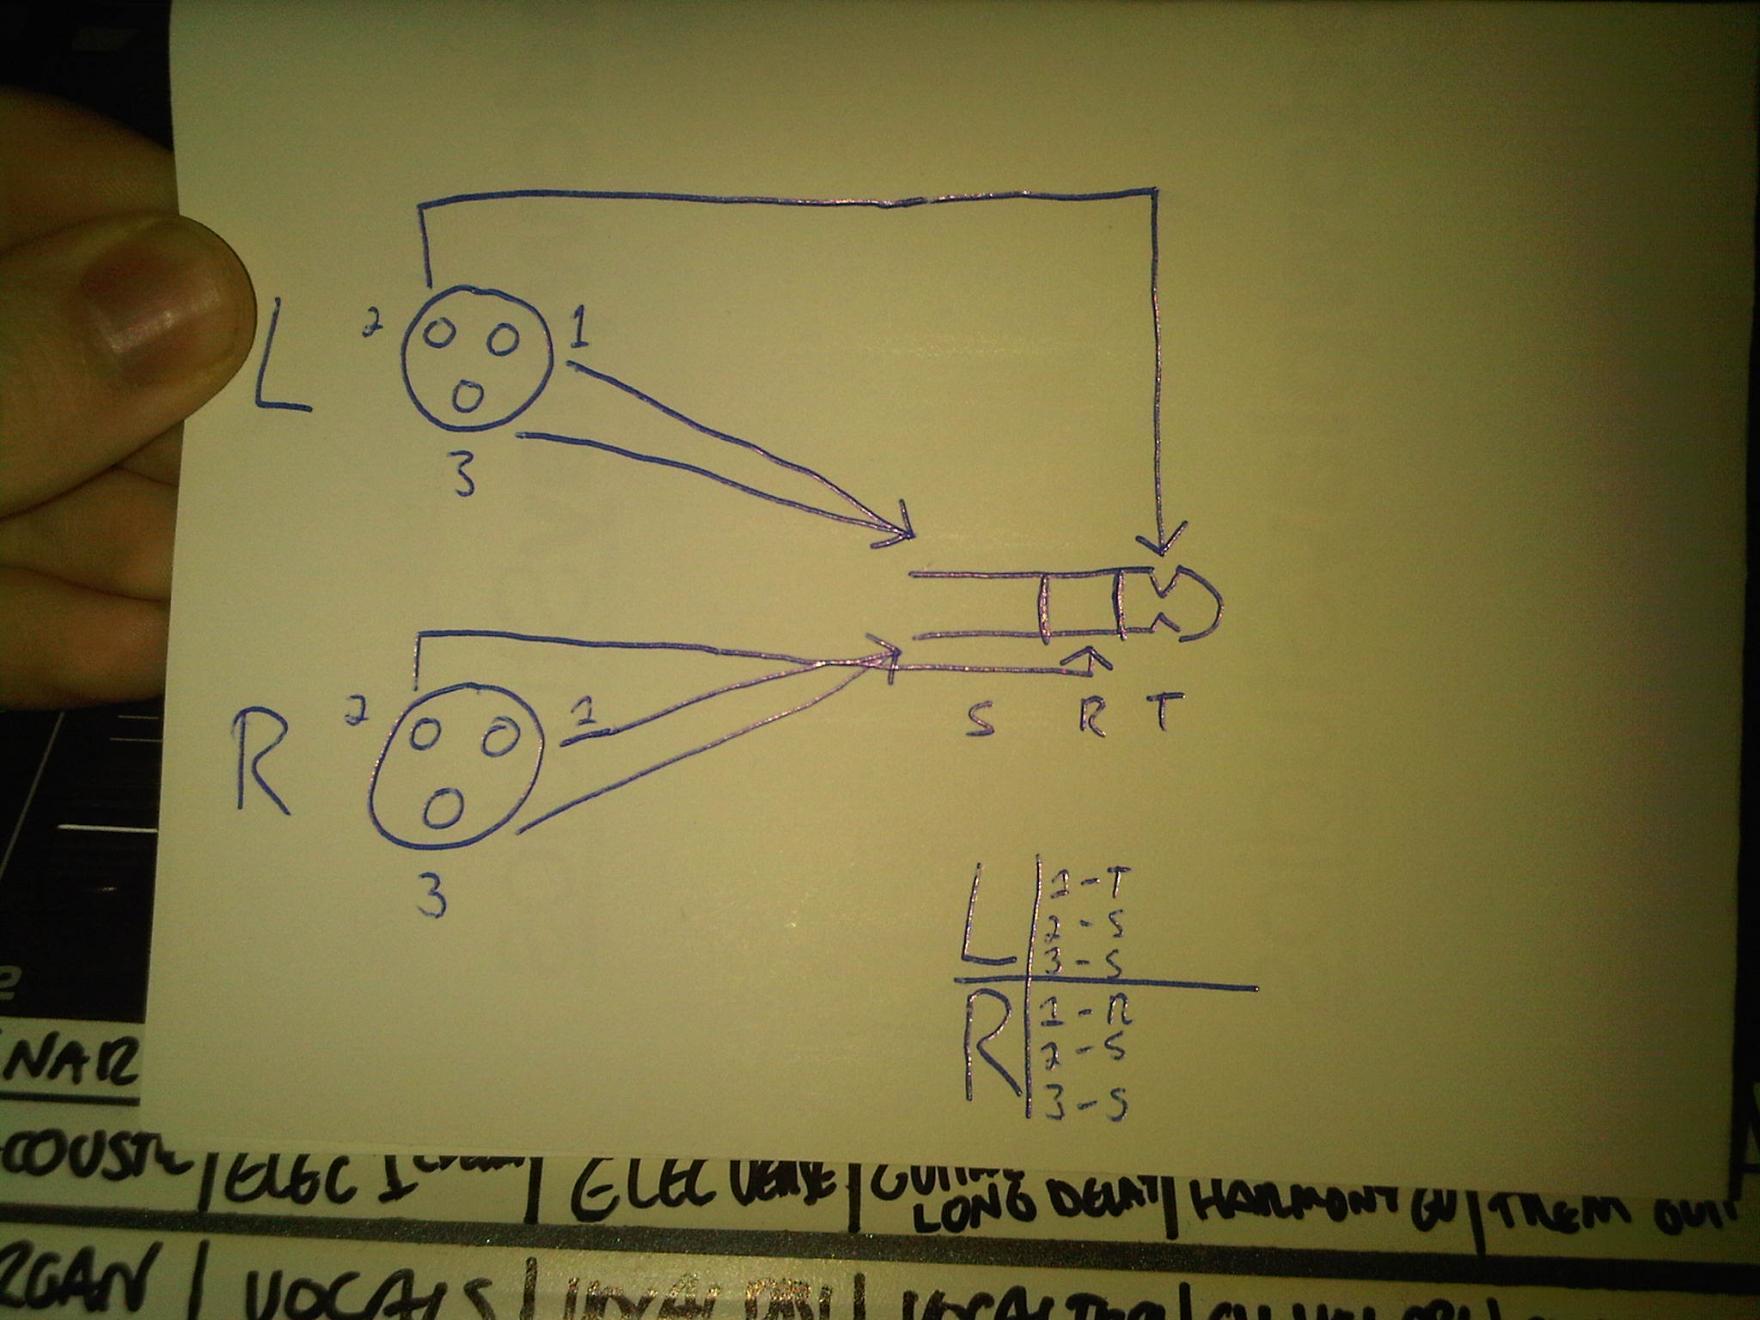 1 4 stereo jack wiring diagram [ 1760 x 1320 Pixel ]